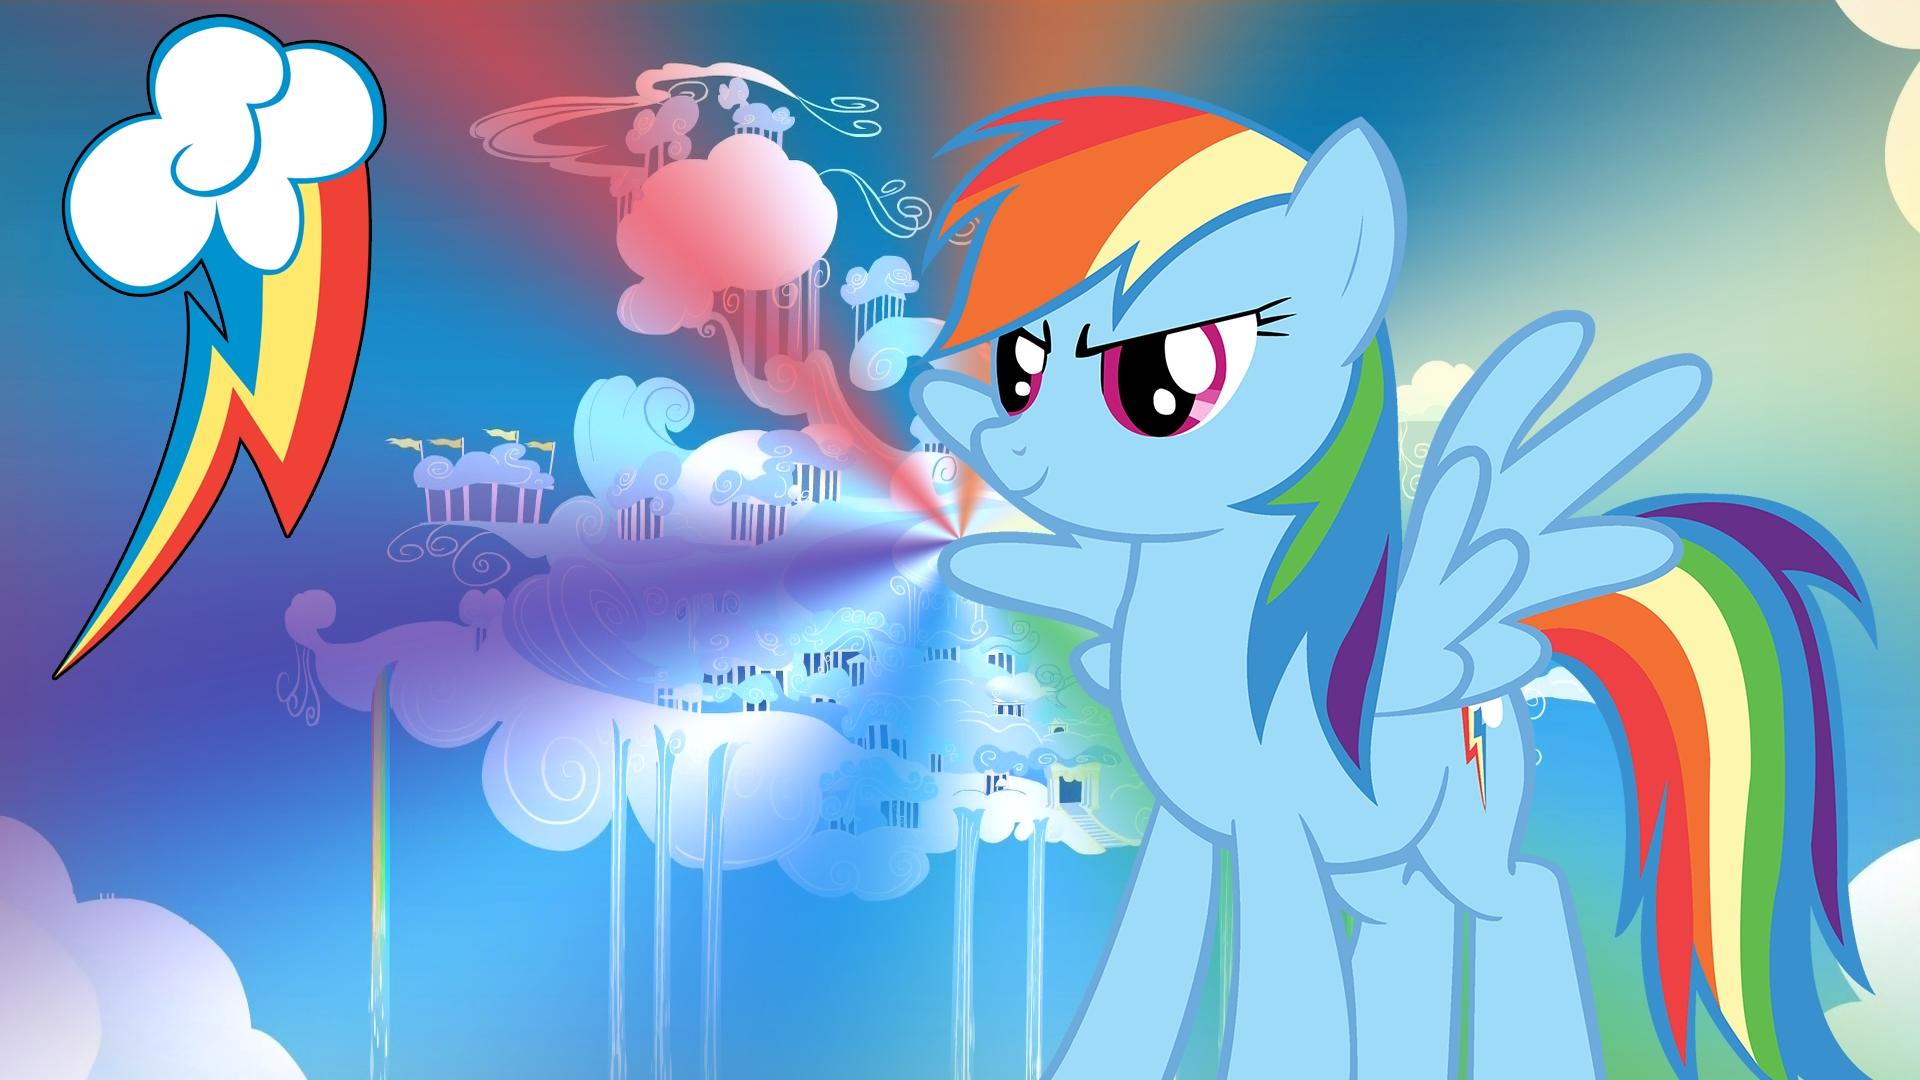 mlp rainbow dash wallpaper | rainbow dash - my little pony wallpaper